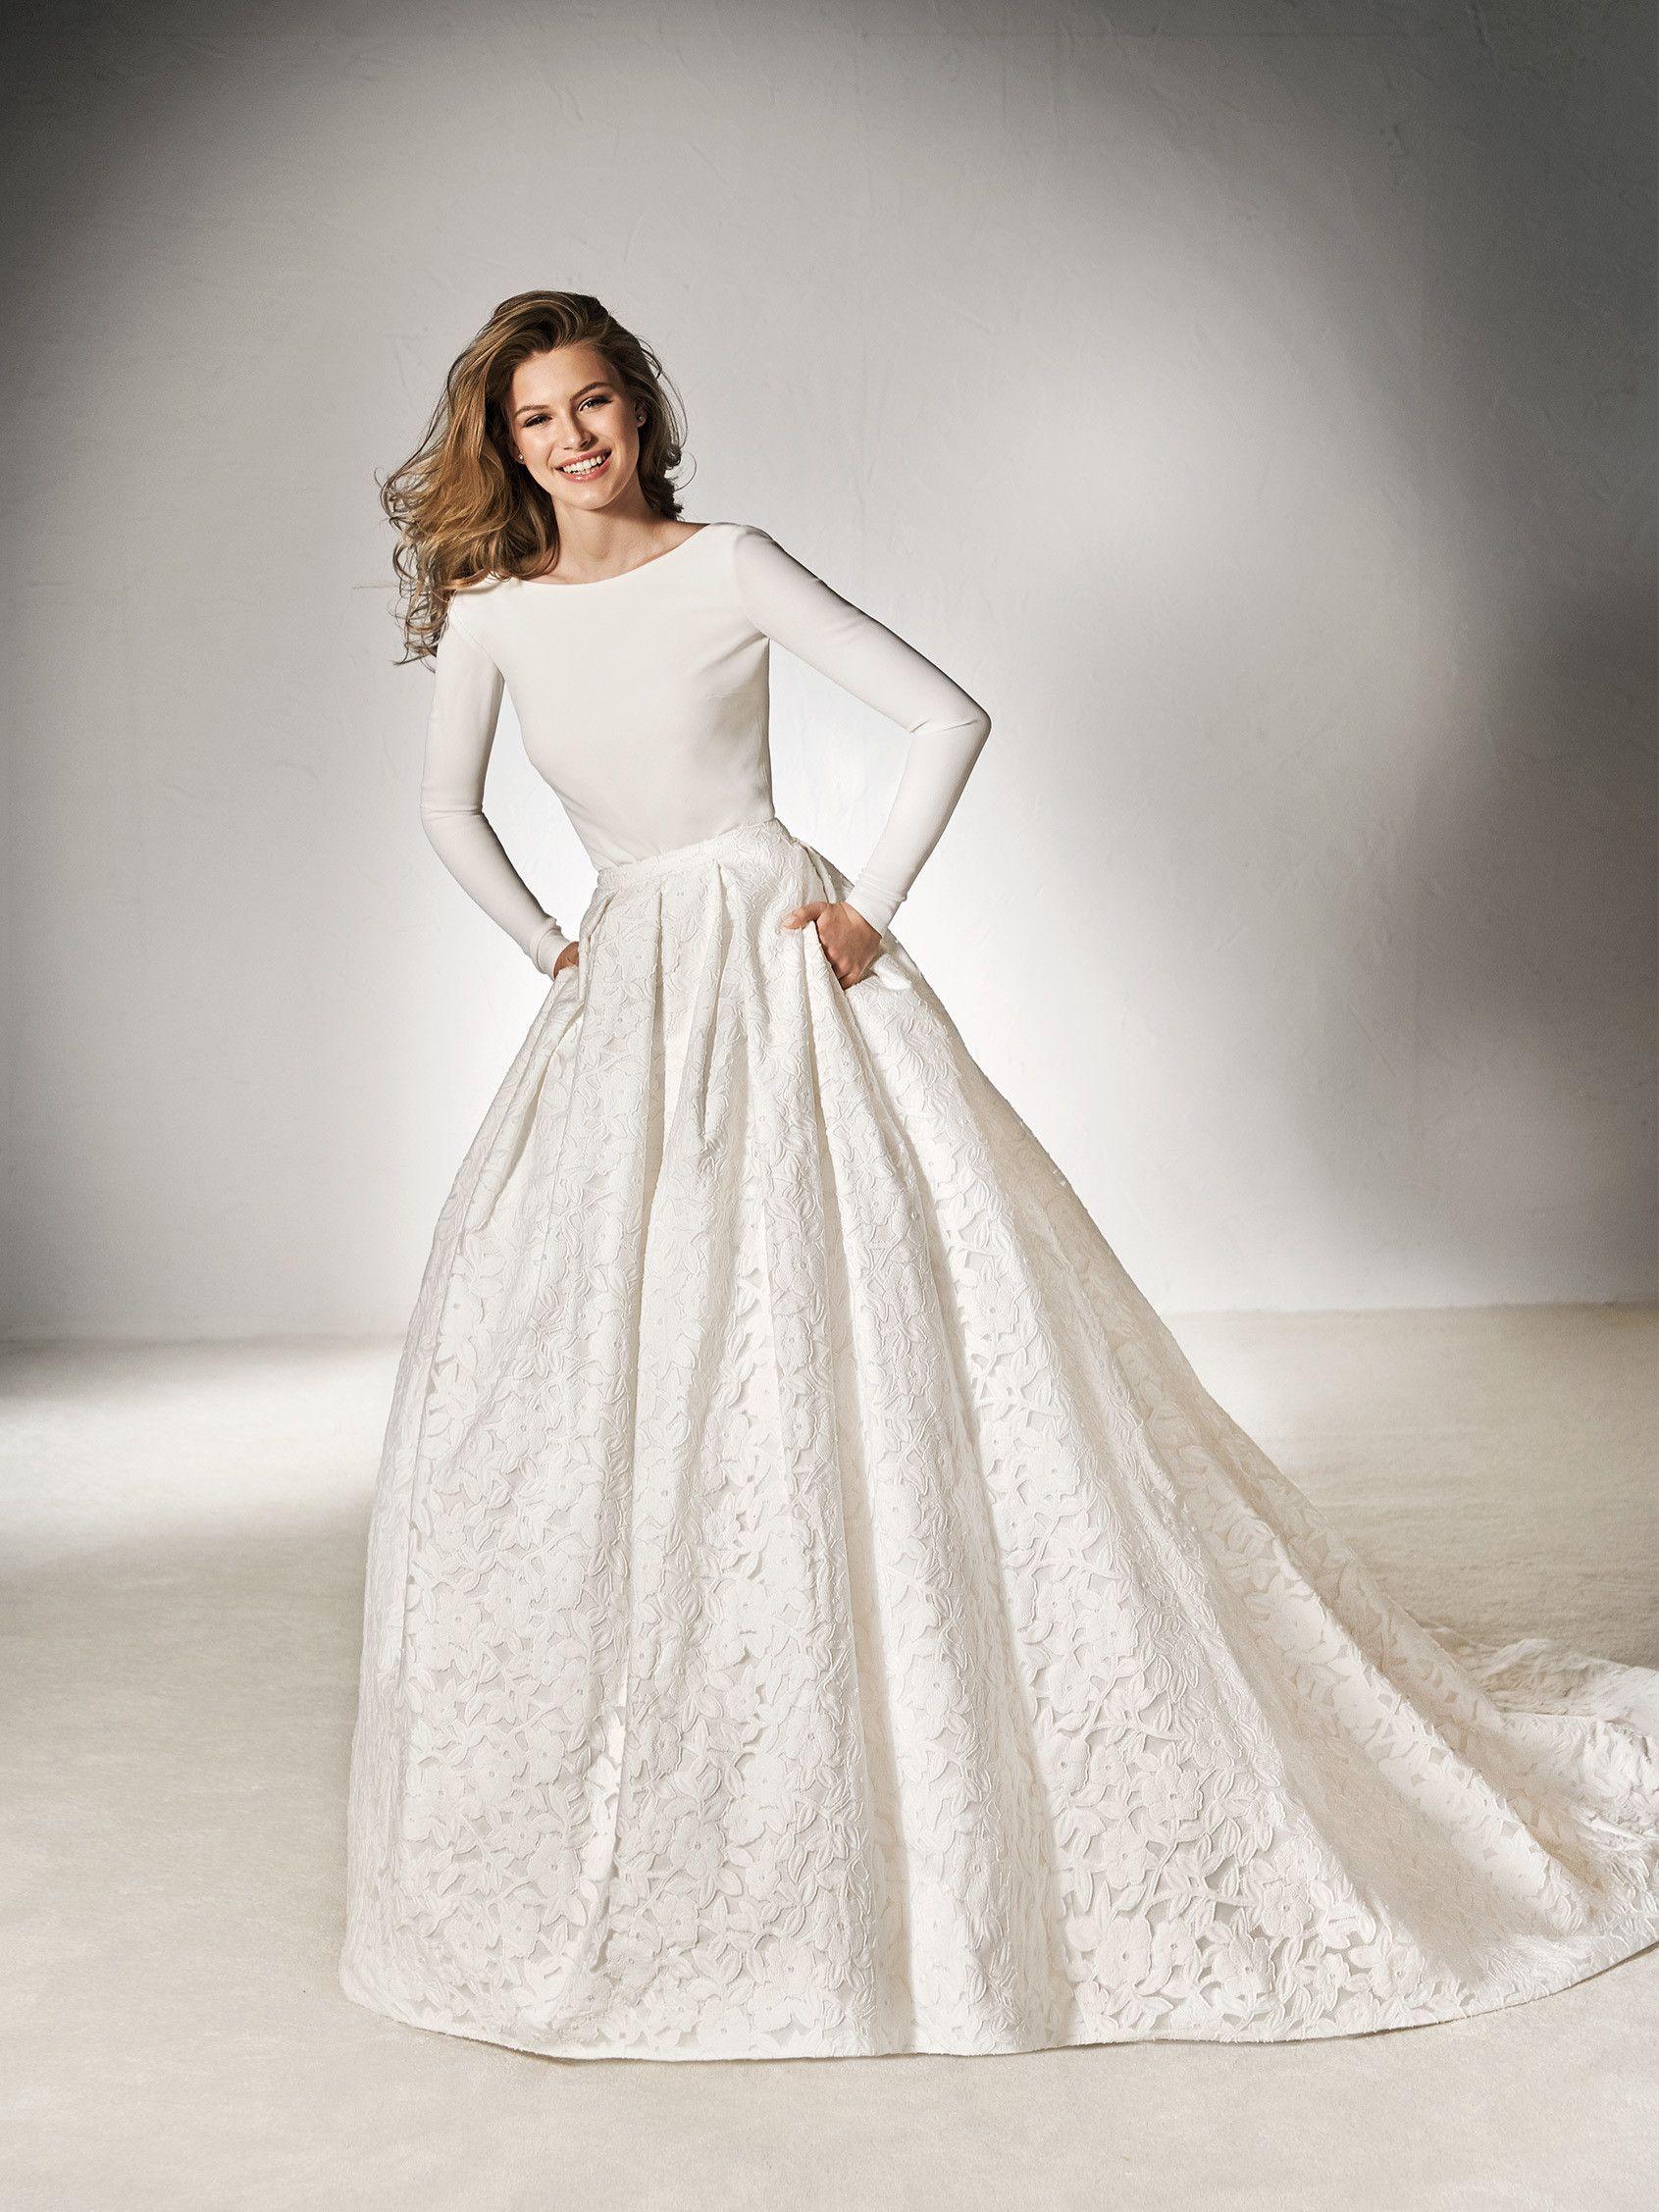 a45ff3d372 Falda de novia clásica - Colección 2018 Pronovias